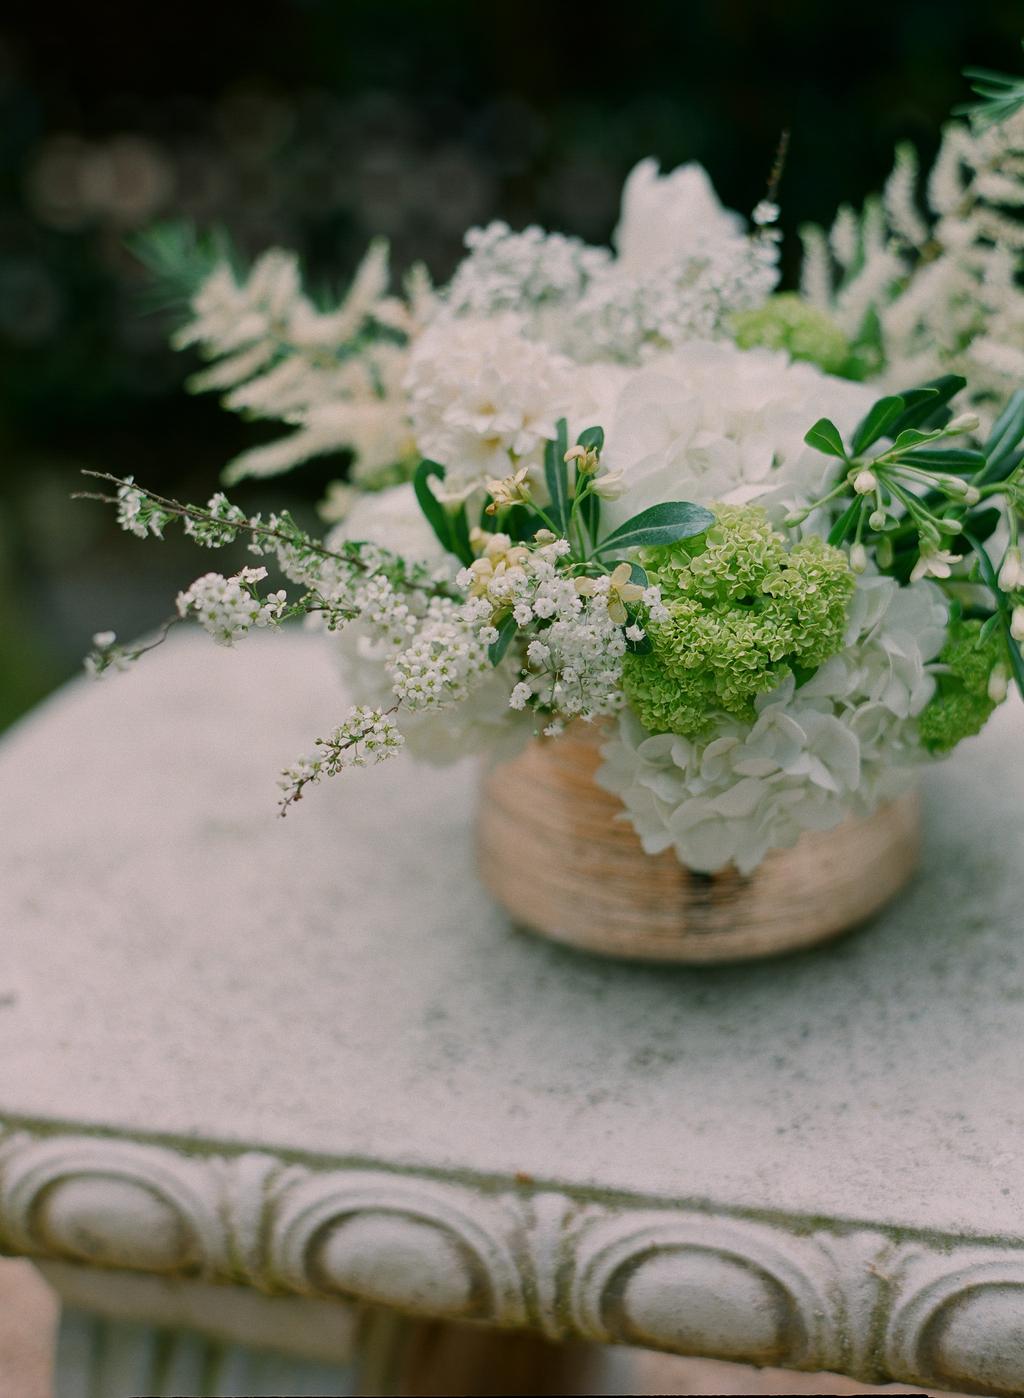 Styled-wedding-santa-barbara-chic-beaux-arts-photographie-italian-bohemian-wedding-venue-flowers-white-bouquet-058.full